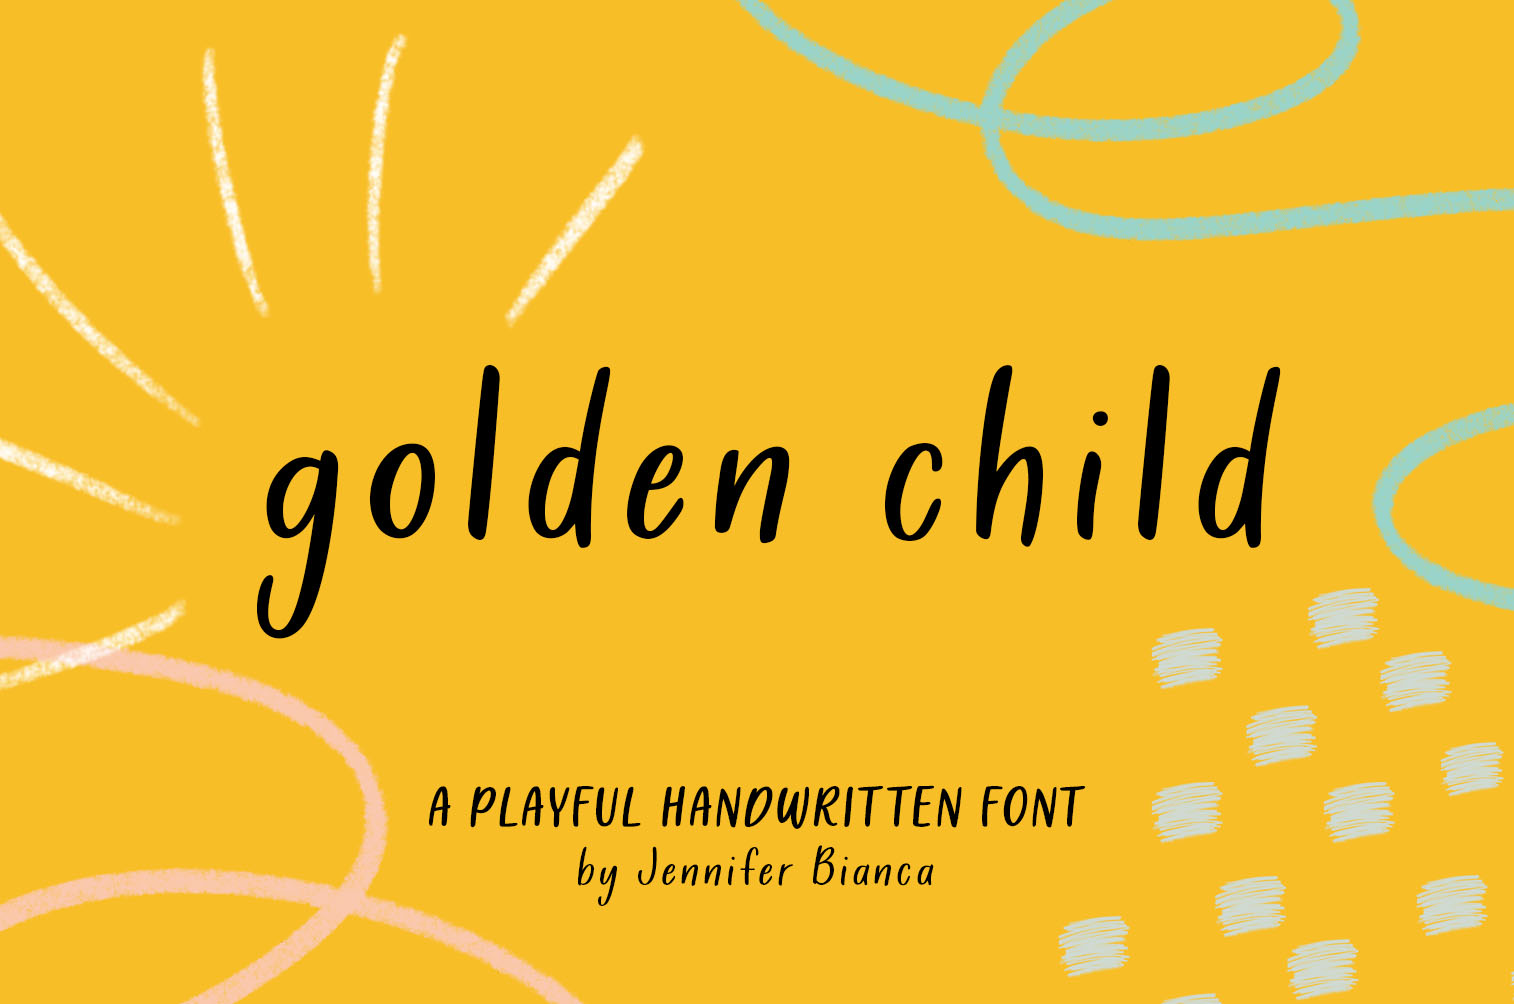 goldenchild1.jpg